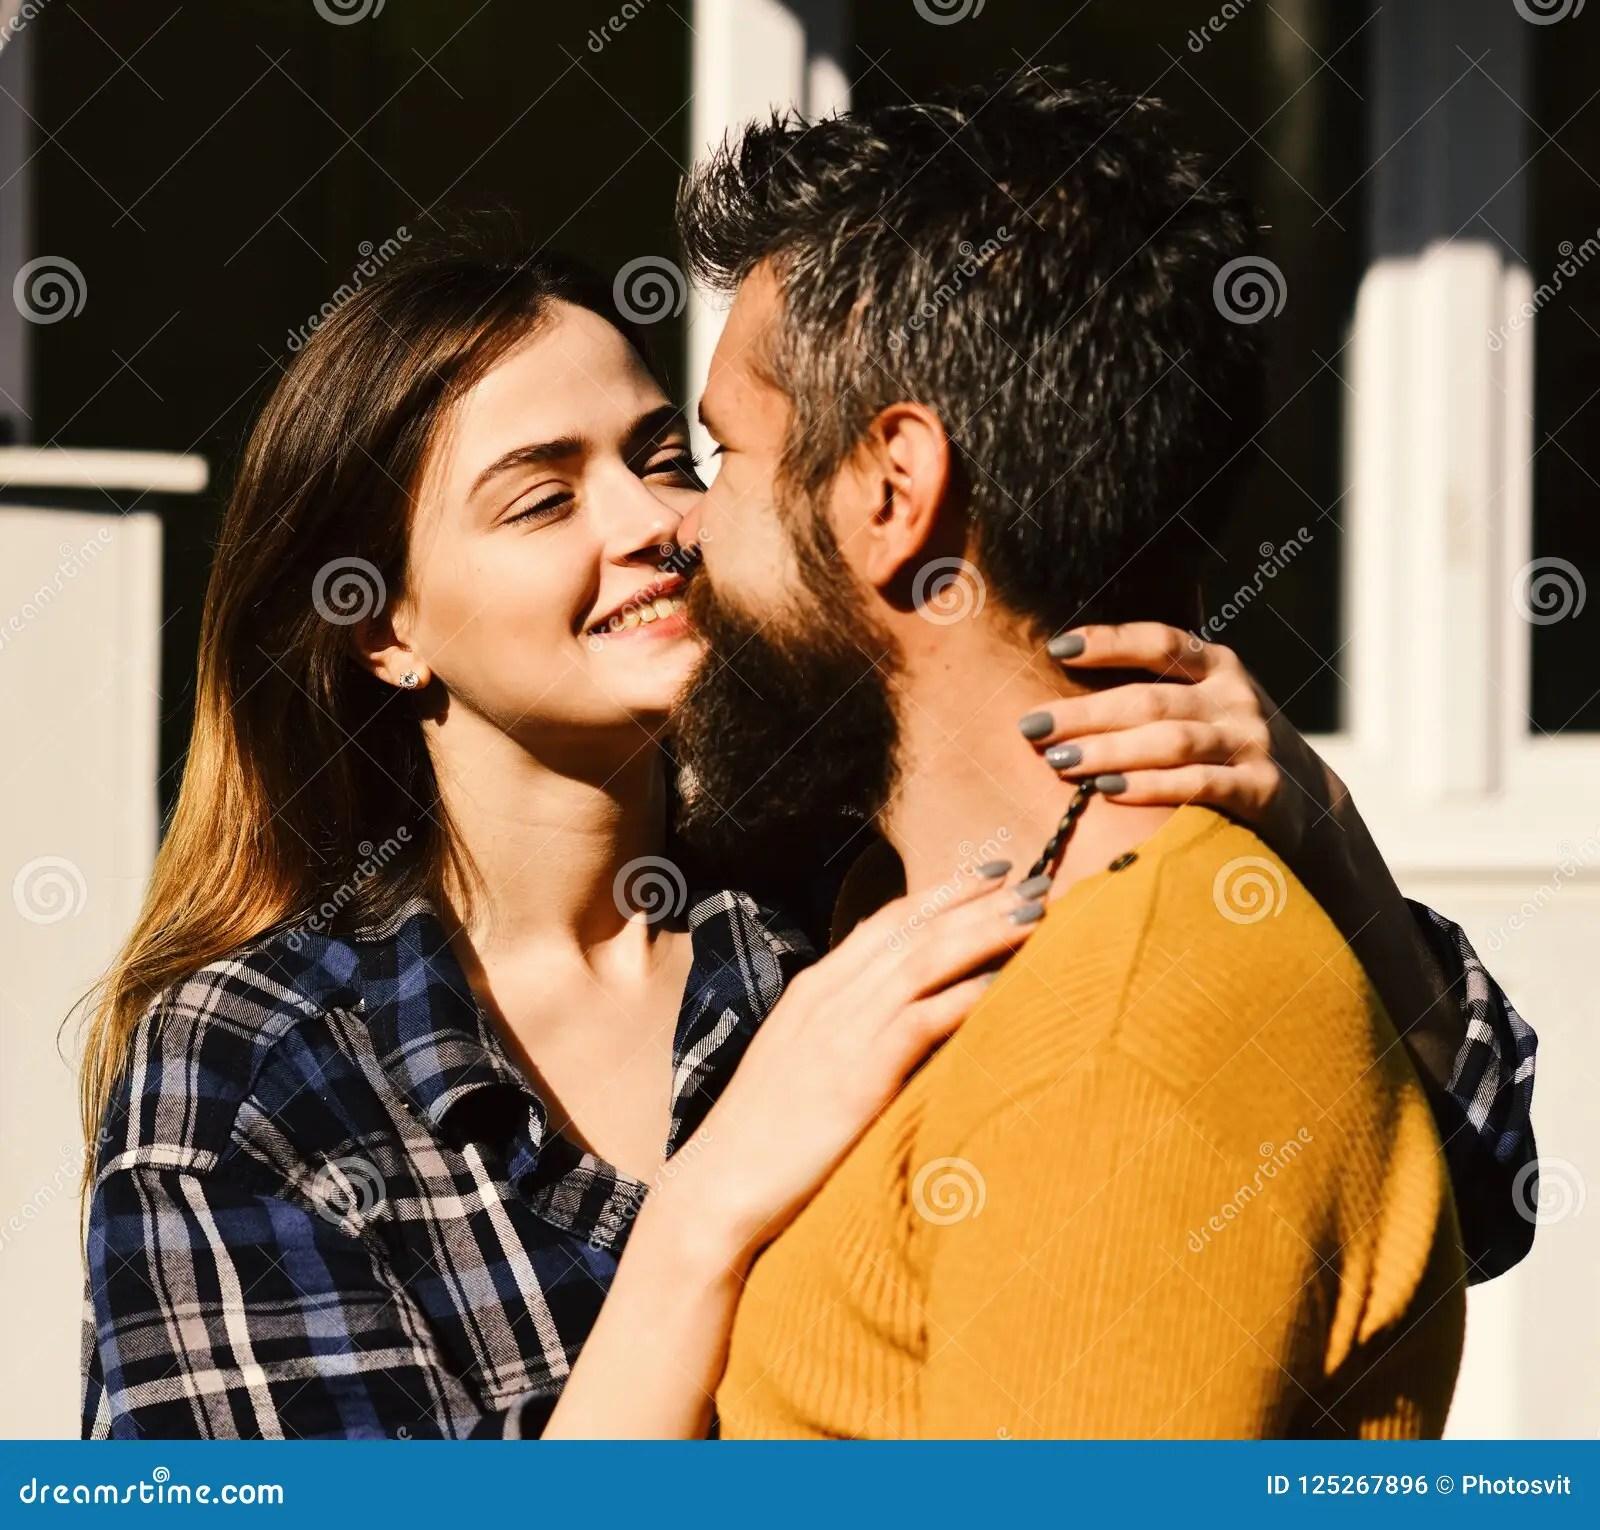 girl and bearded guy